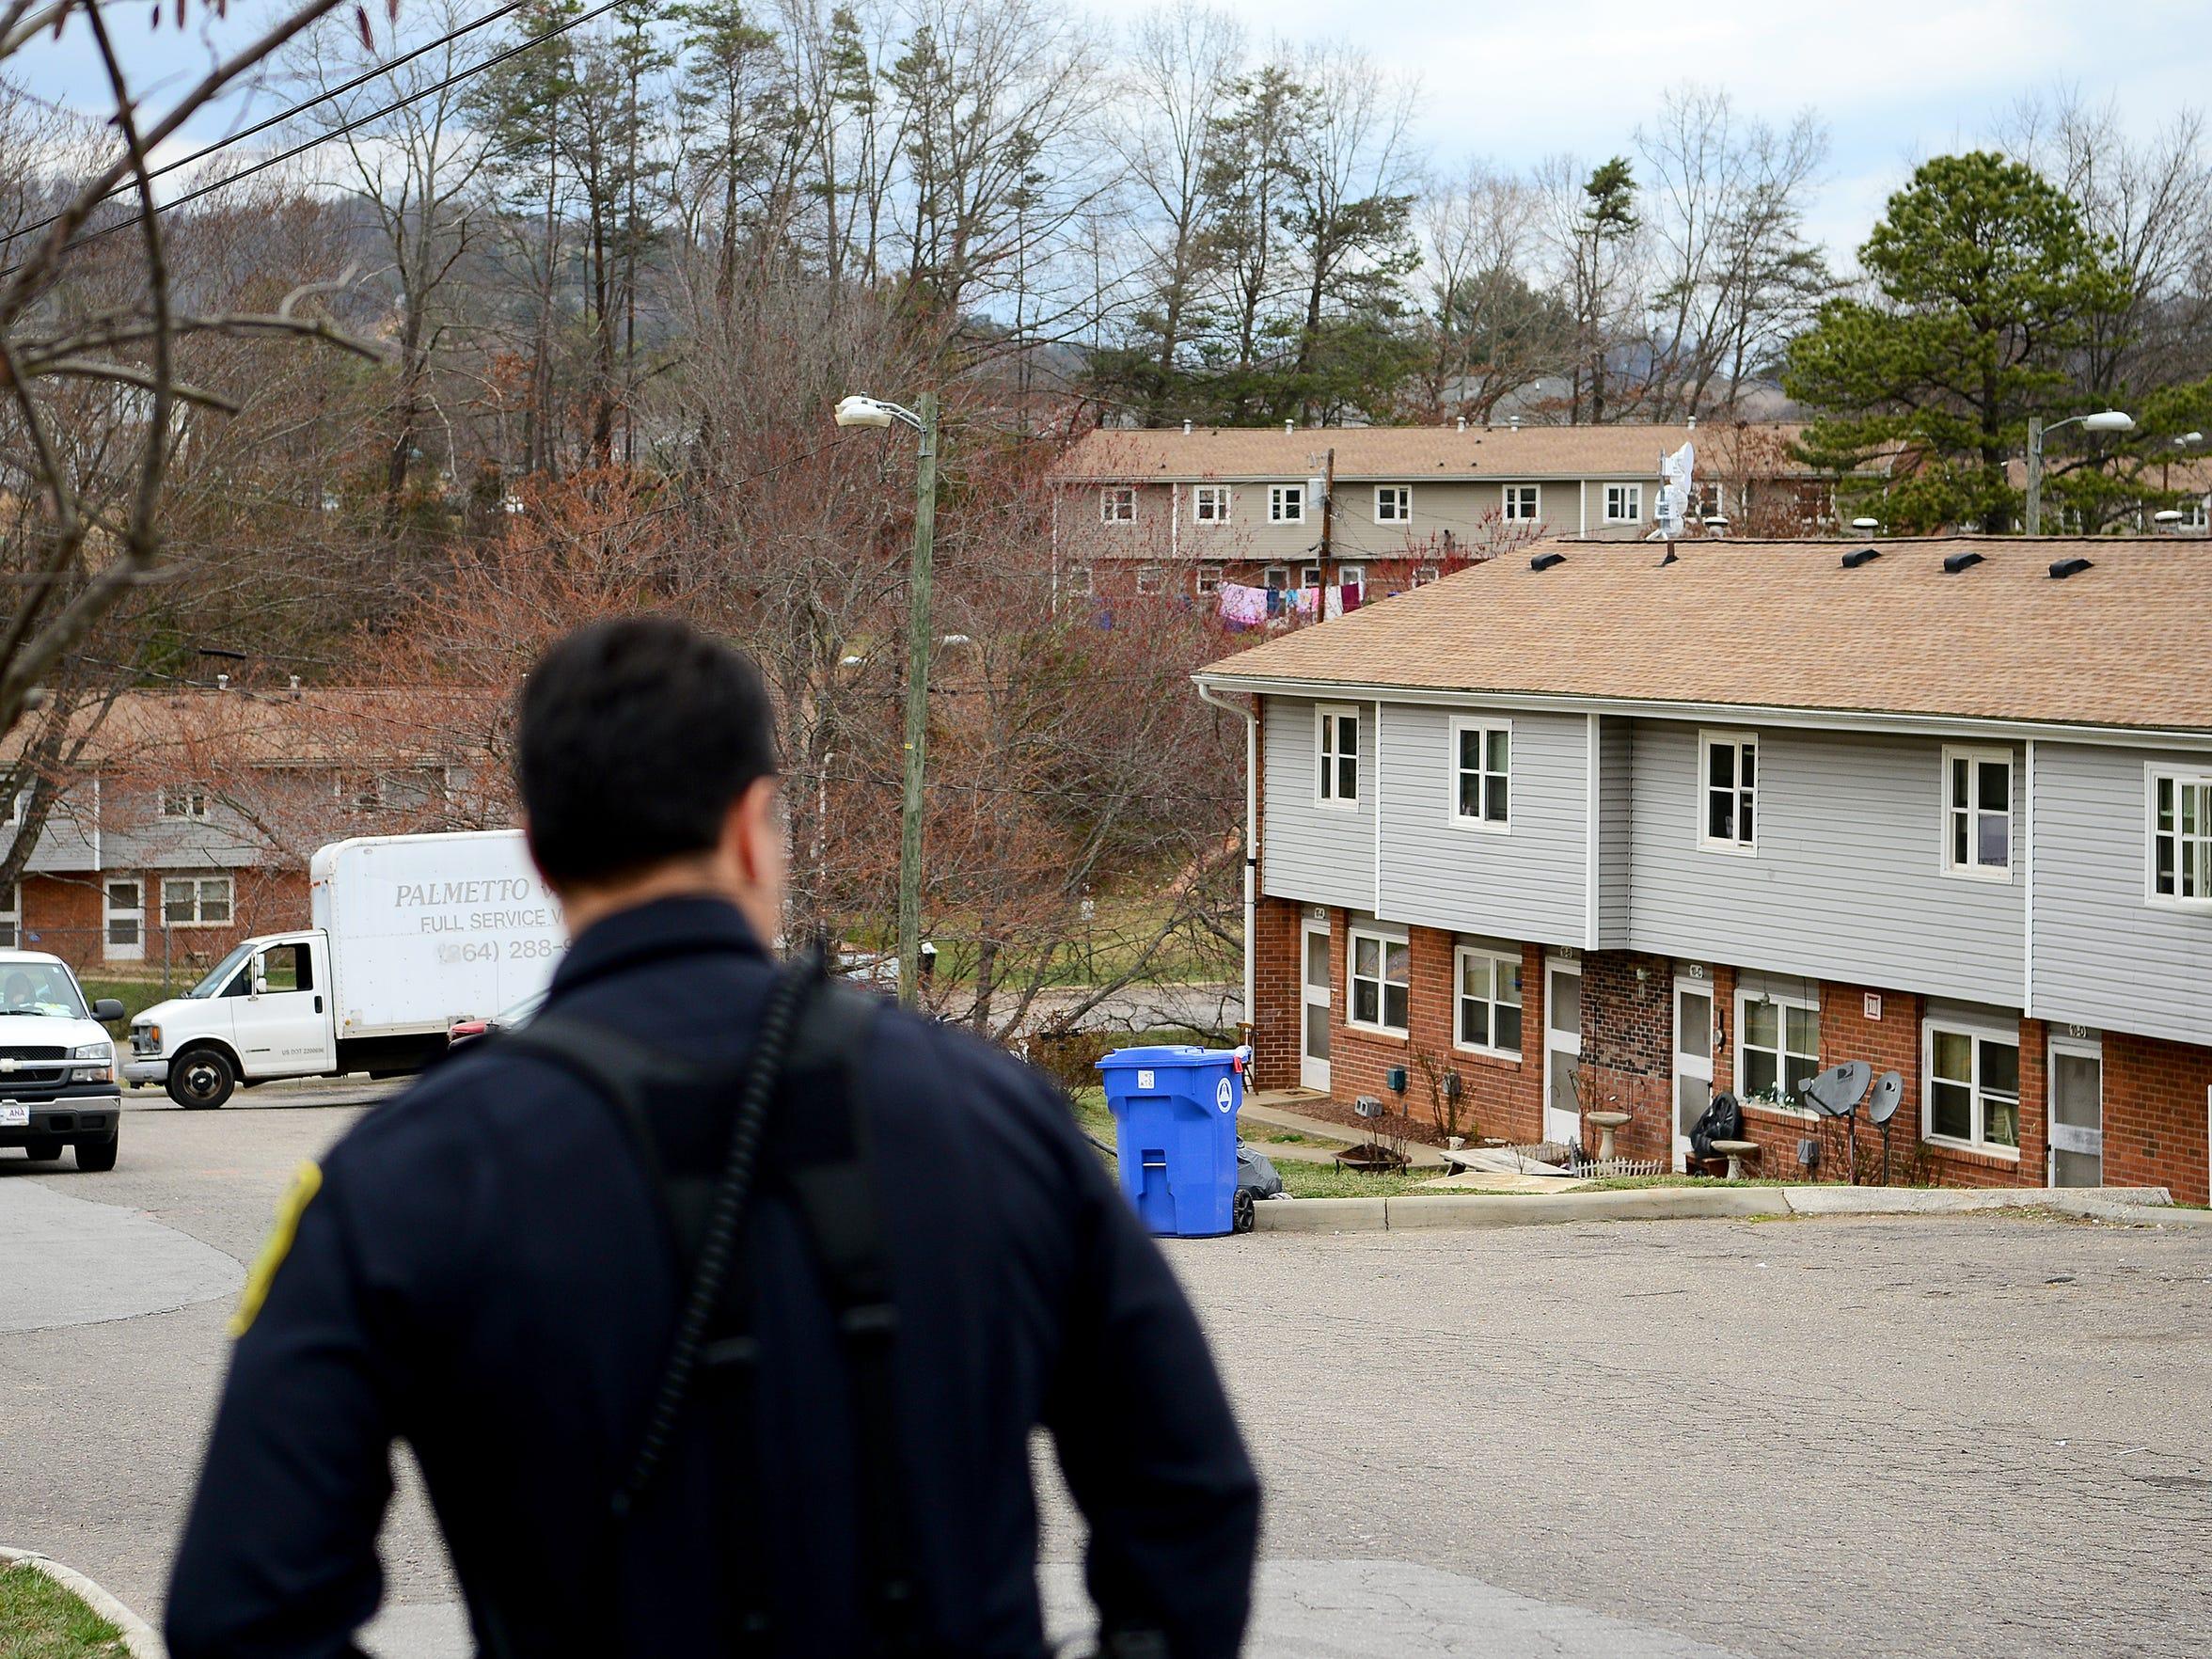 Lt. Mike Lamb patrols the Deaverview Apartments development